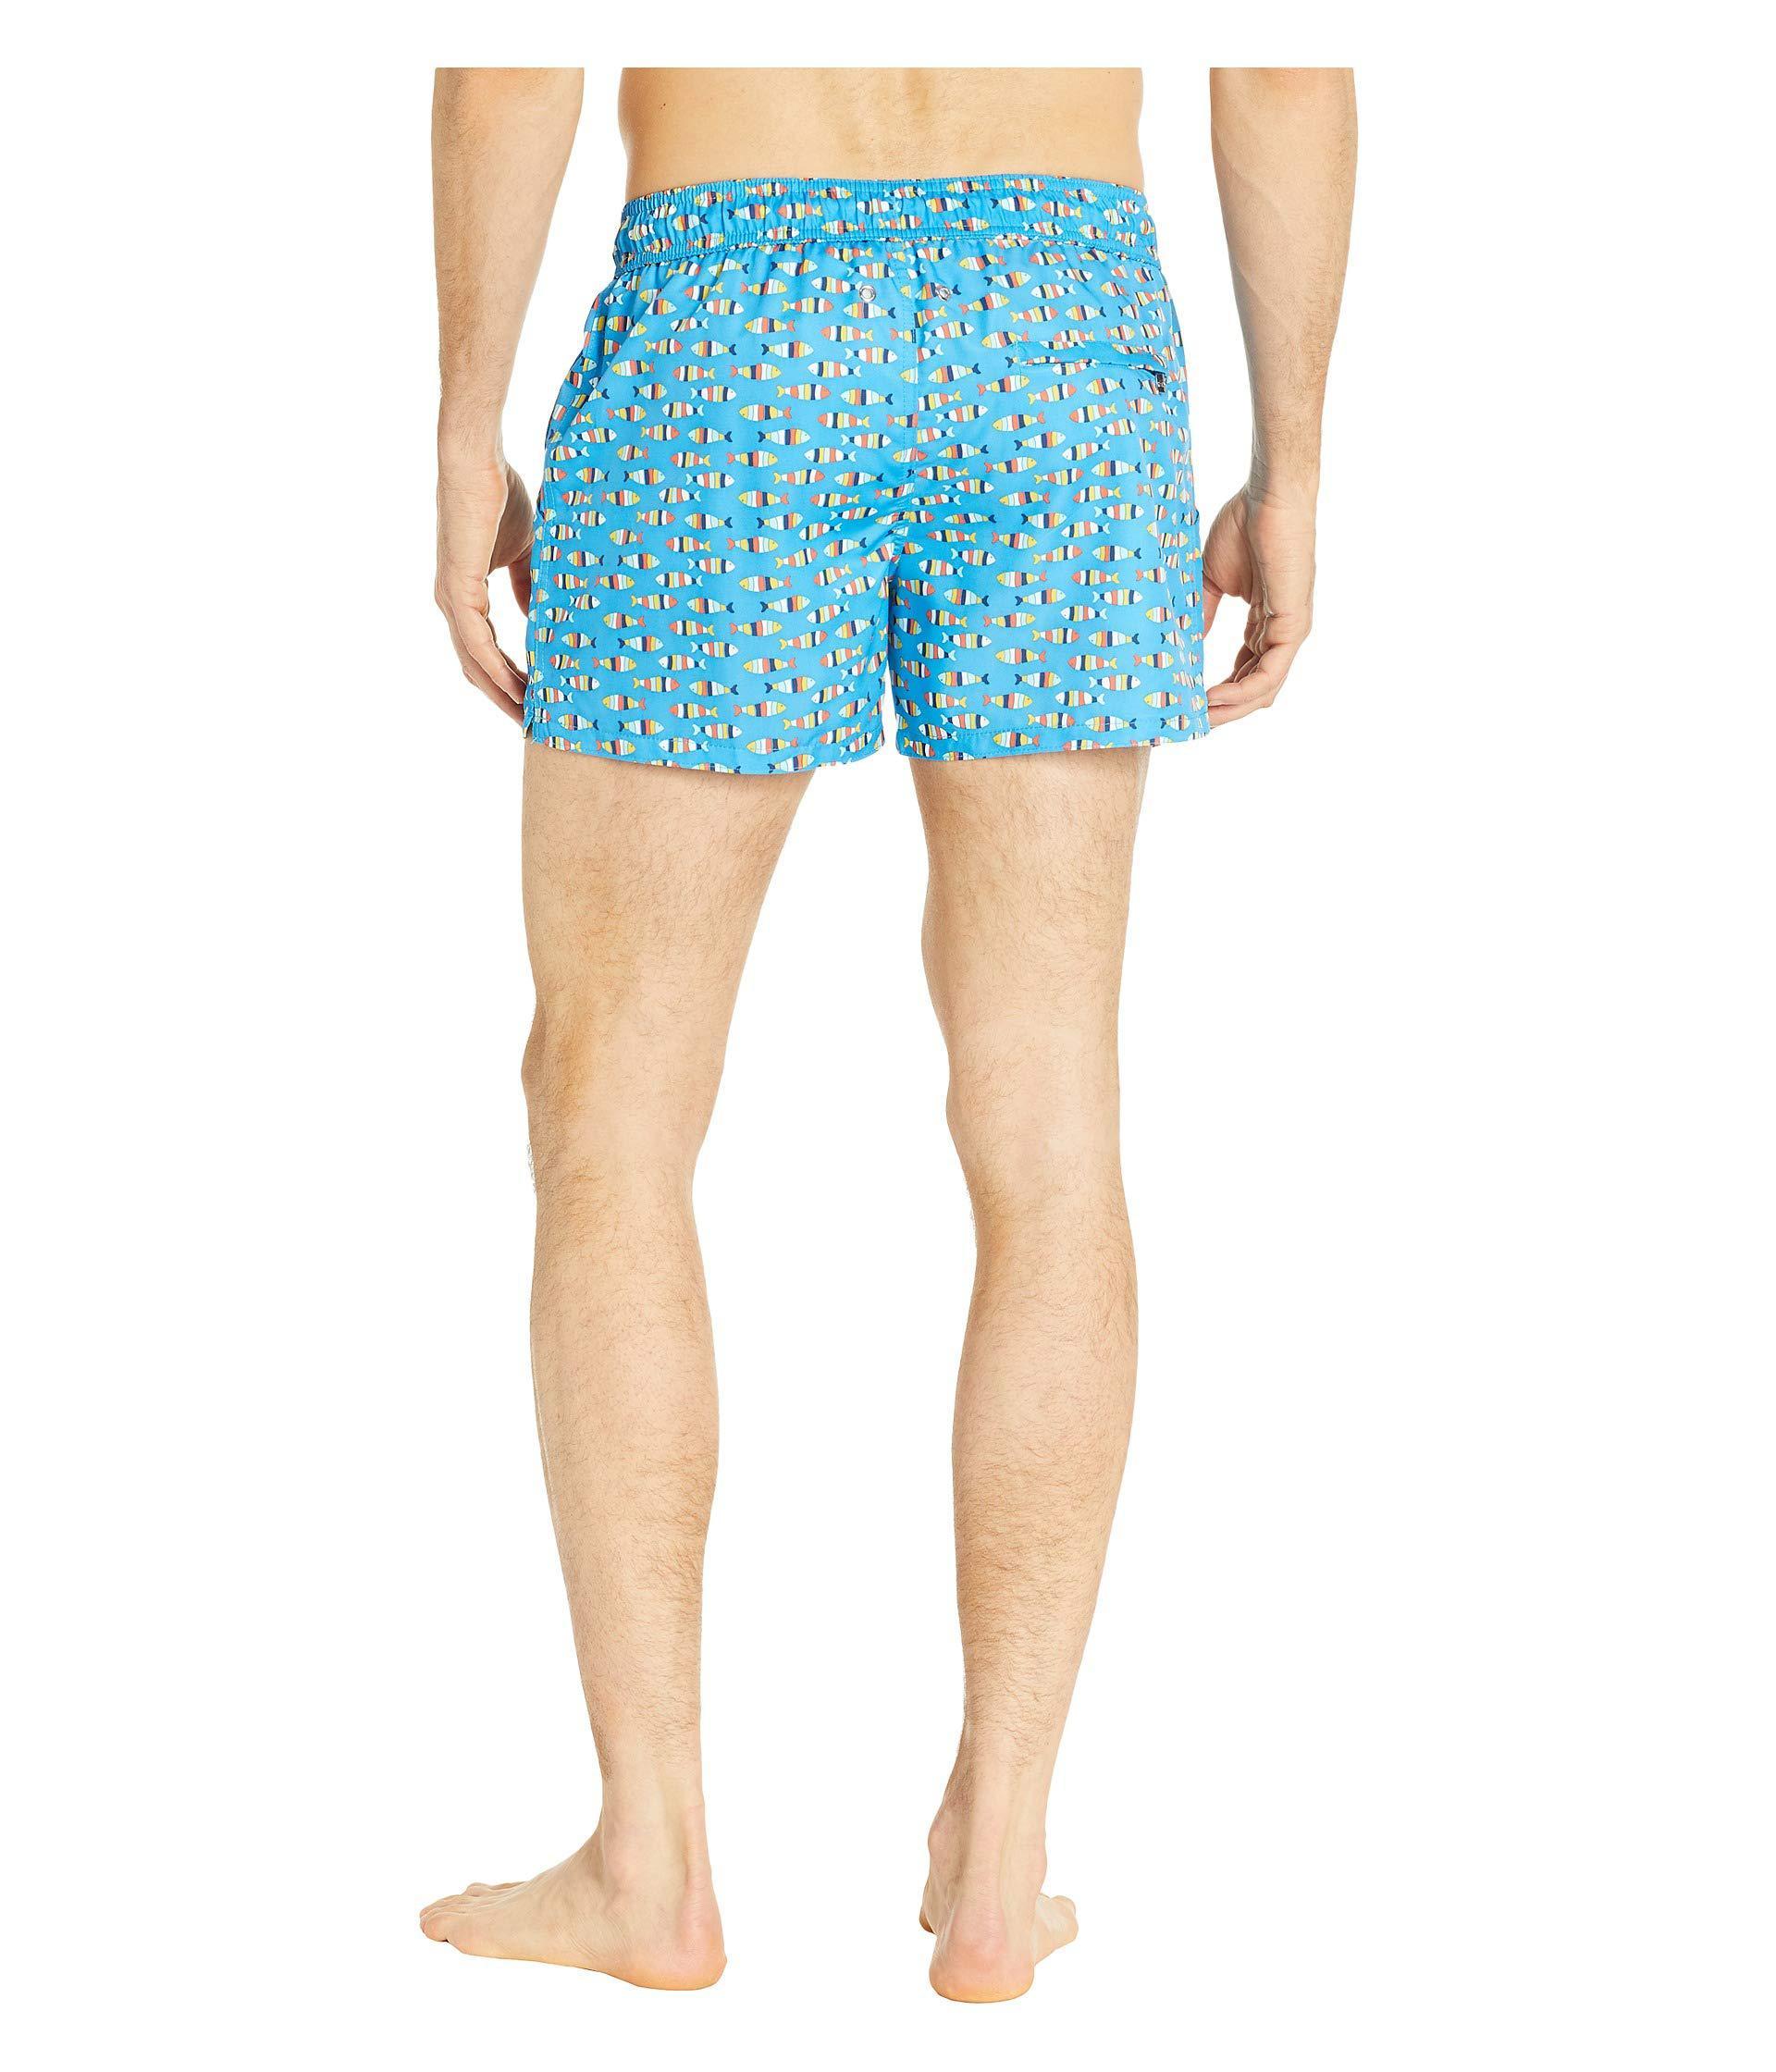 6060ffec99 ... Fashion Woven Ibiza Swim Shorts (multi Striped Fish. View fullscreen